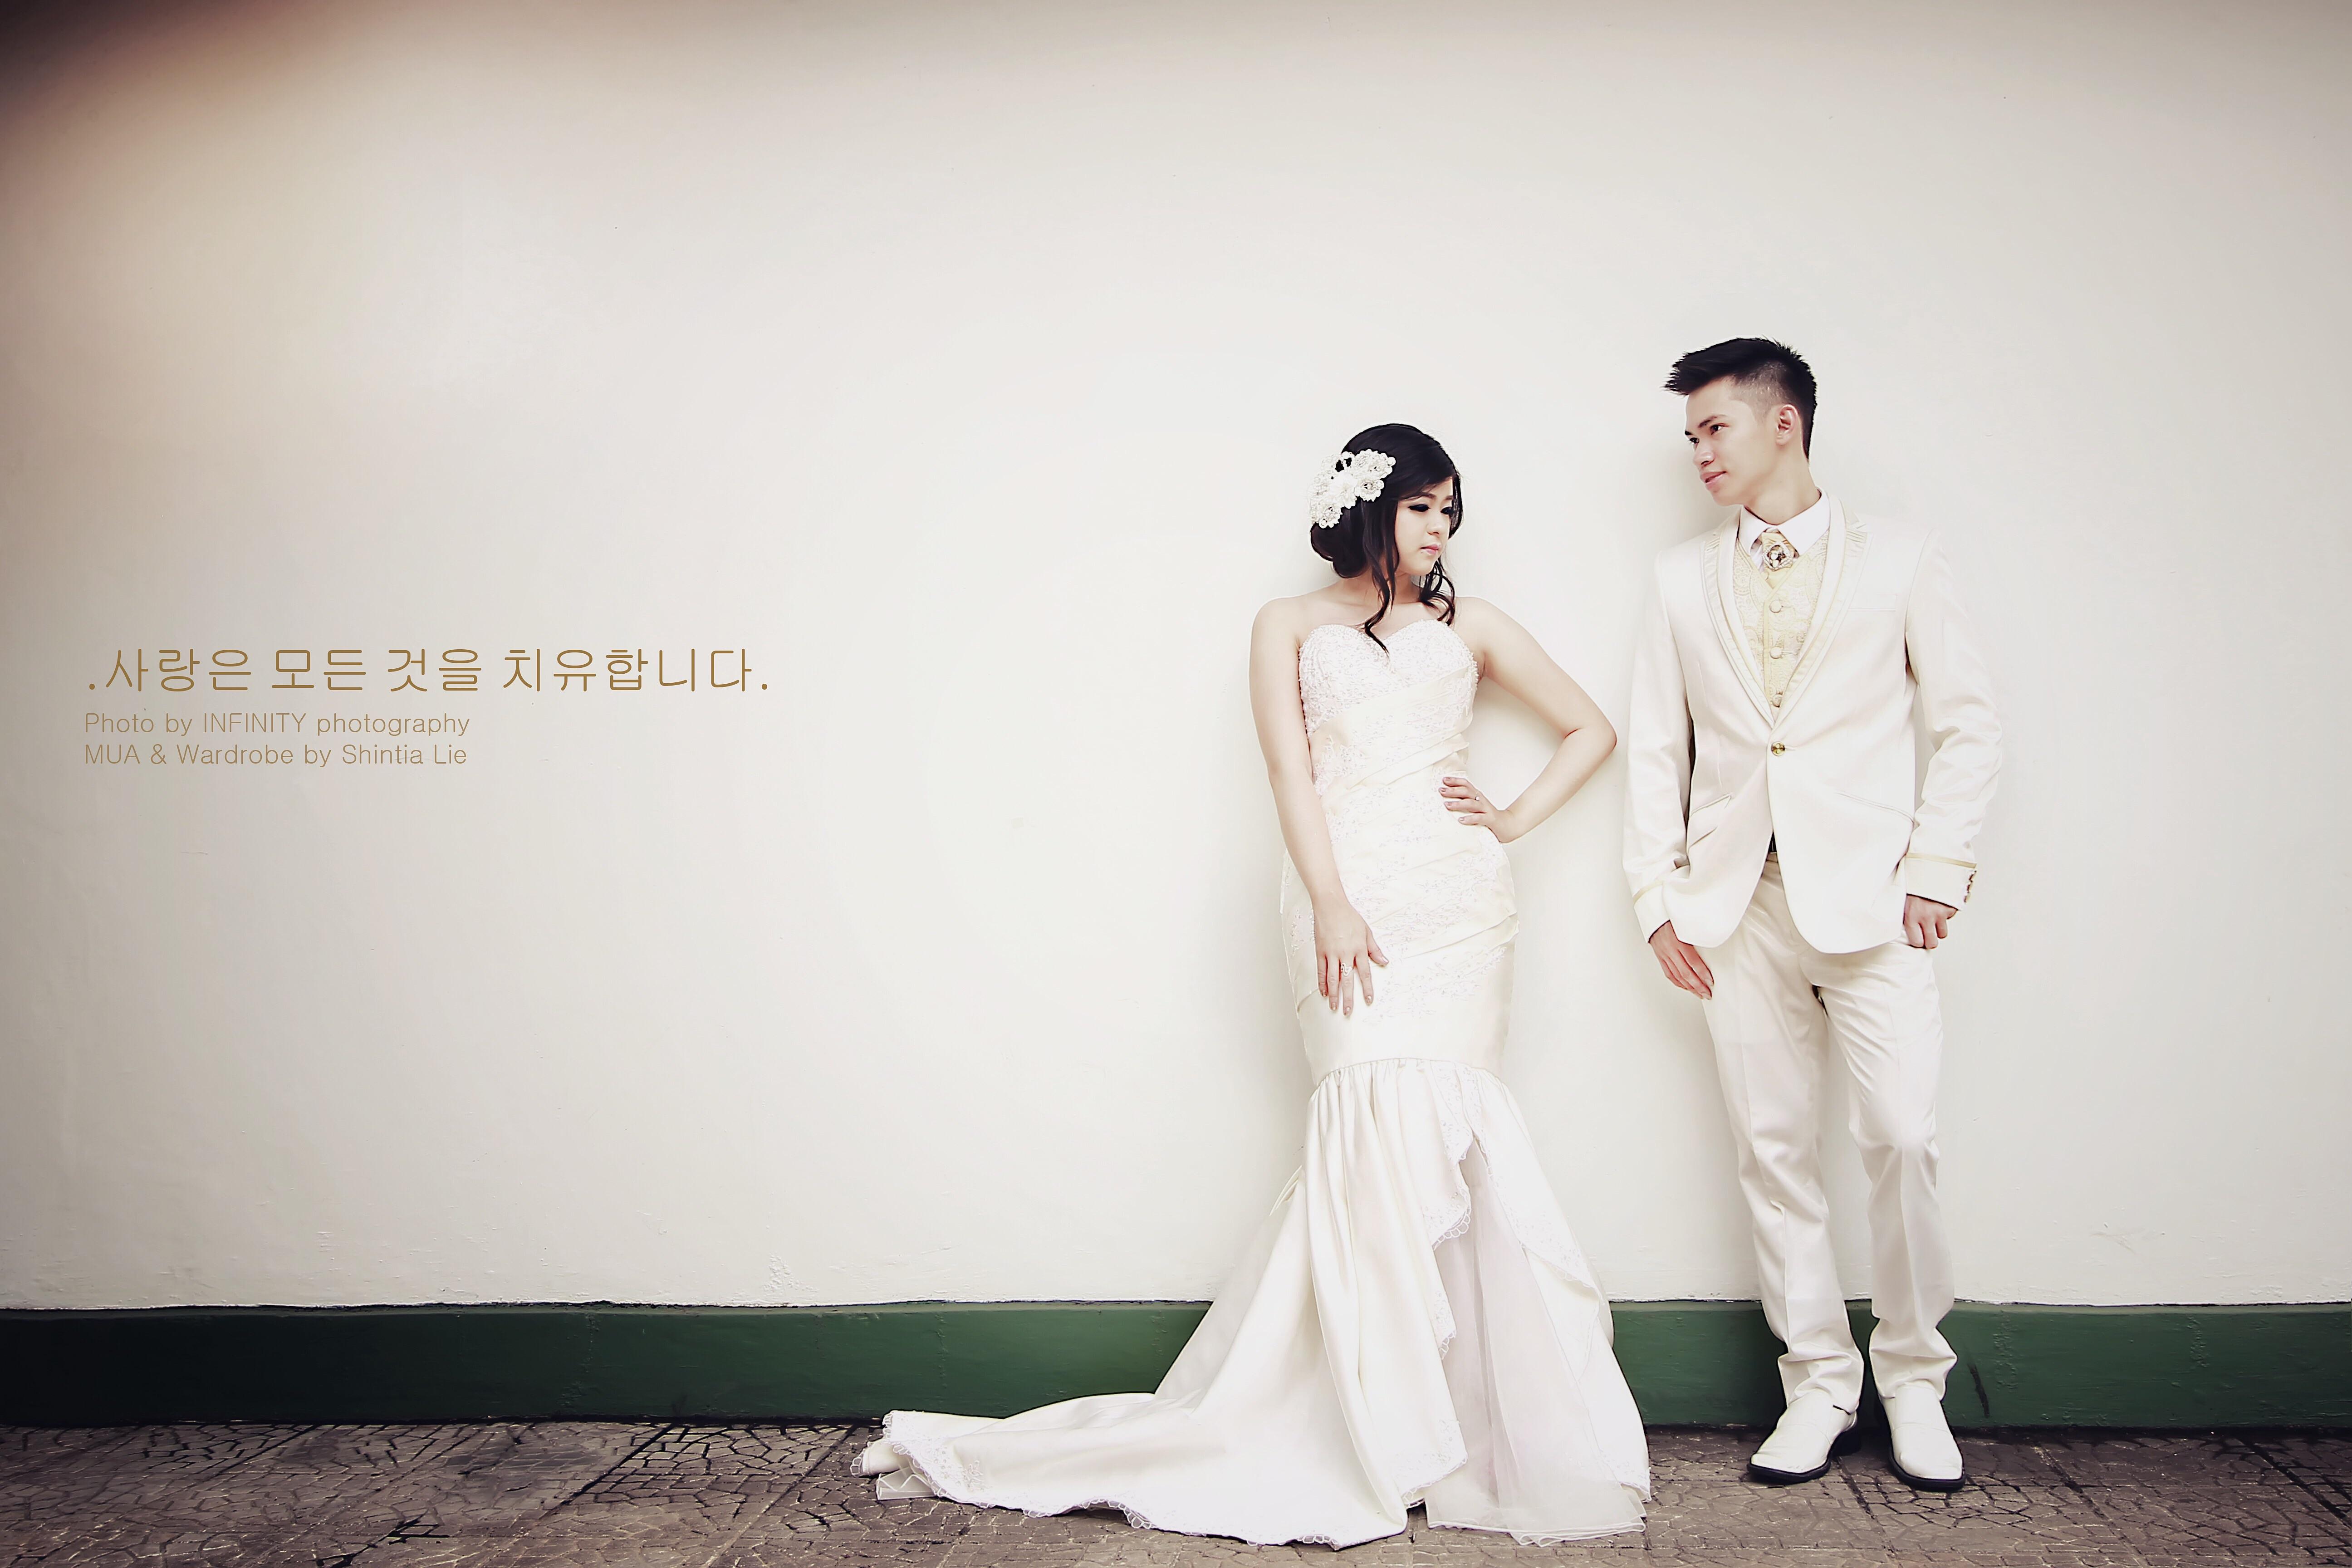 INFINITY photography | Wedding Photography in Samarinda | Bridestory.com